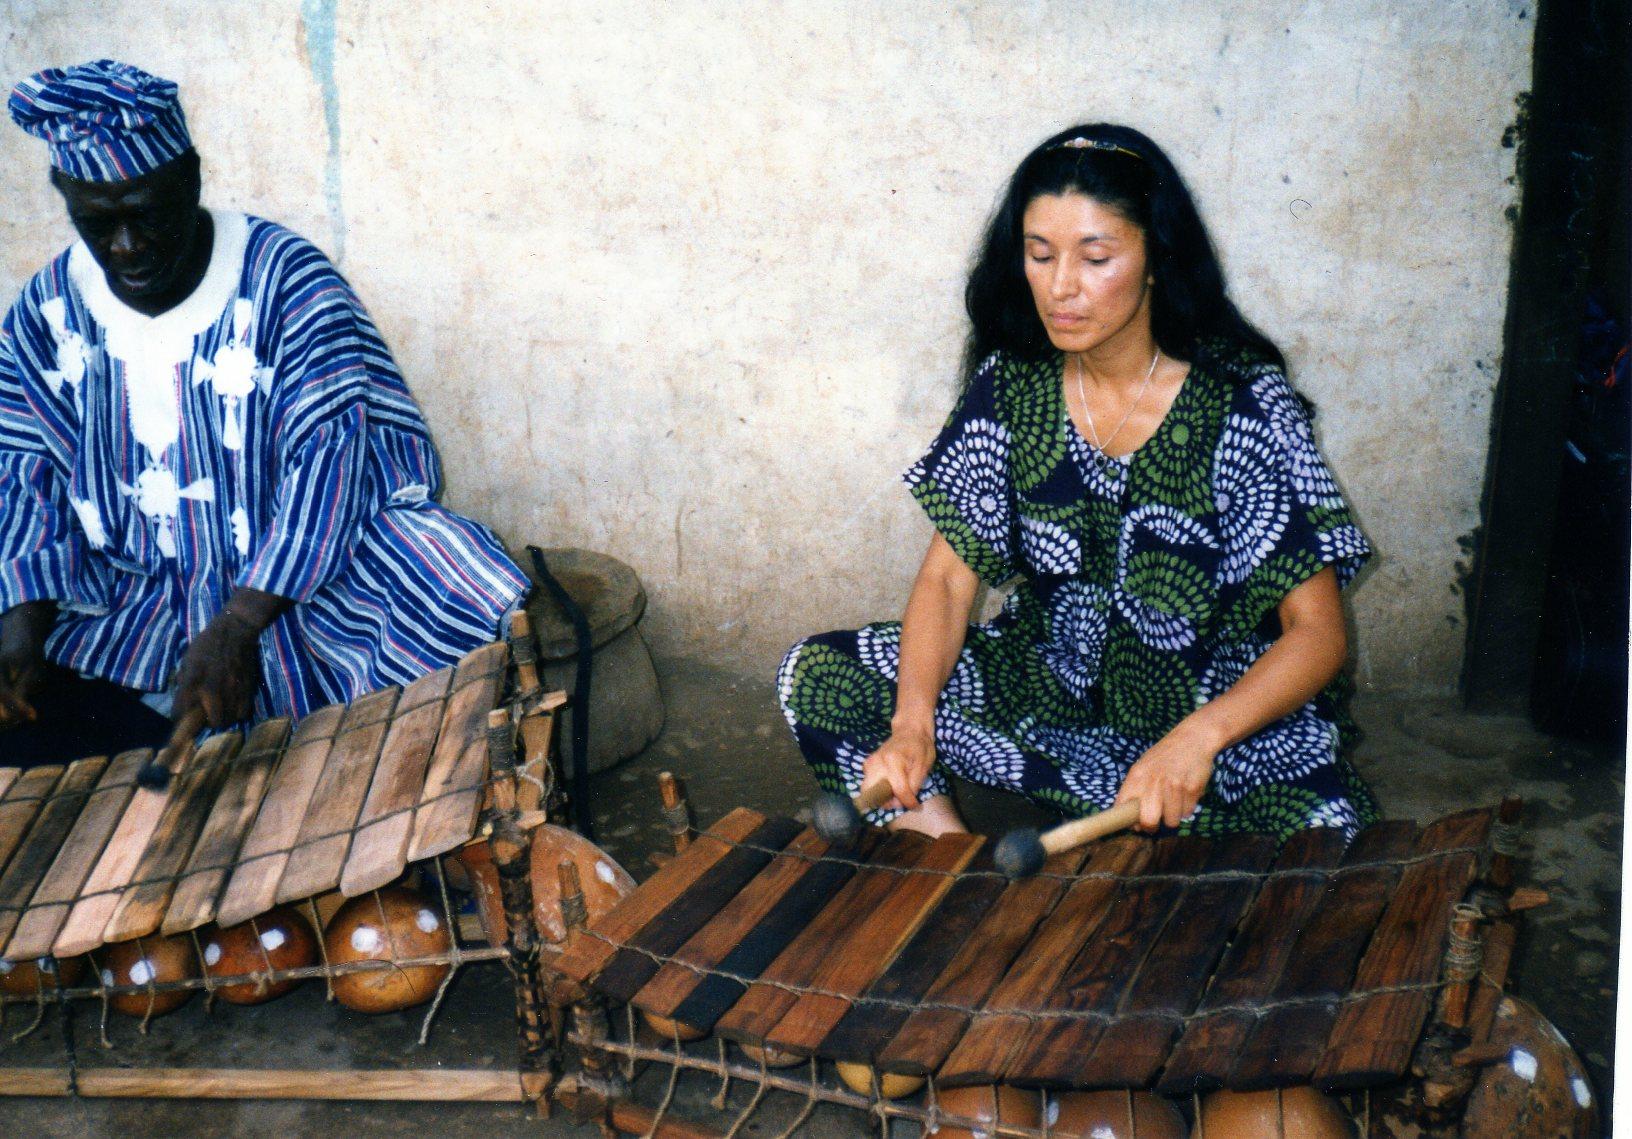 Kakraba Lobi and Valerie Naranjo Photo by Kofi Missio